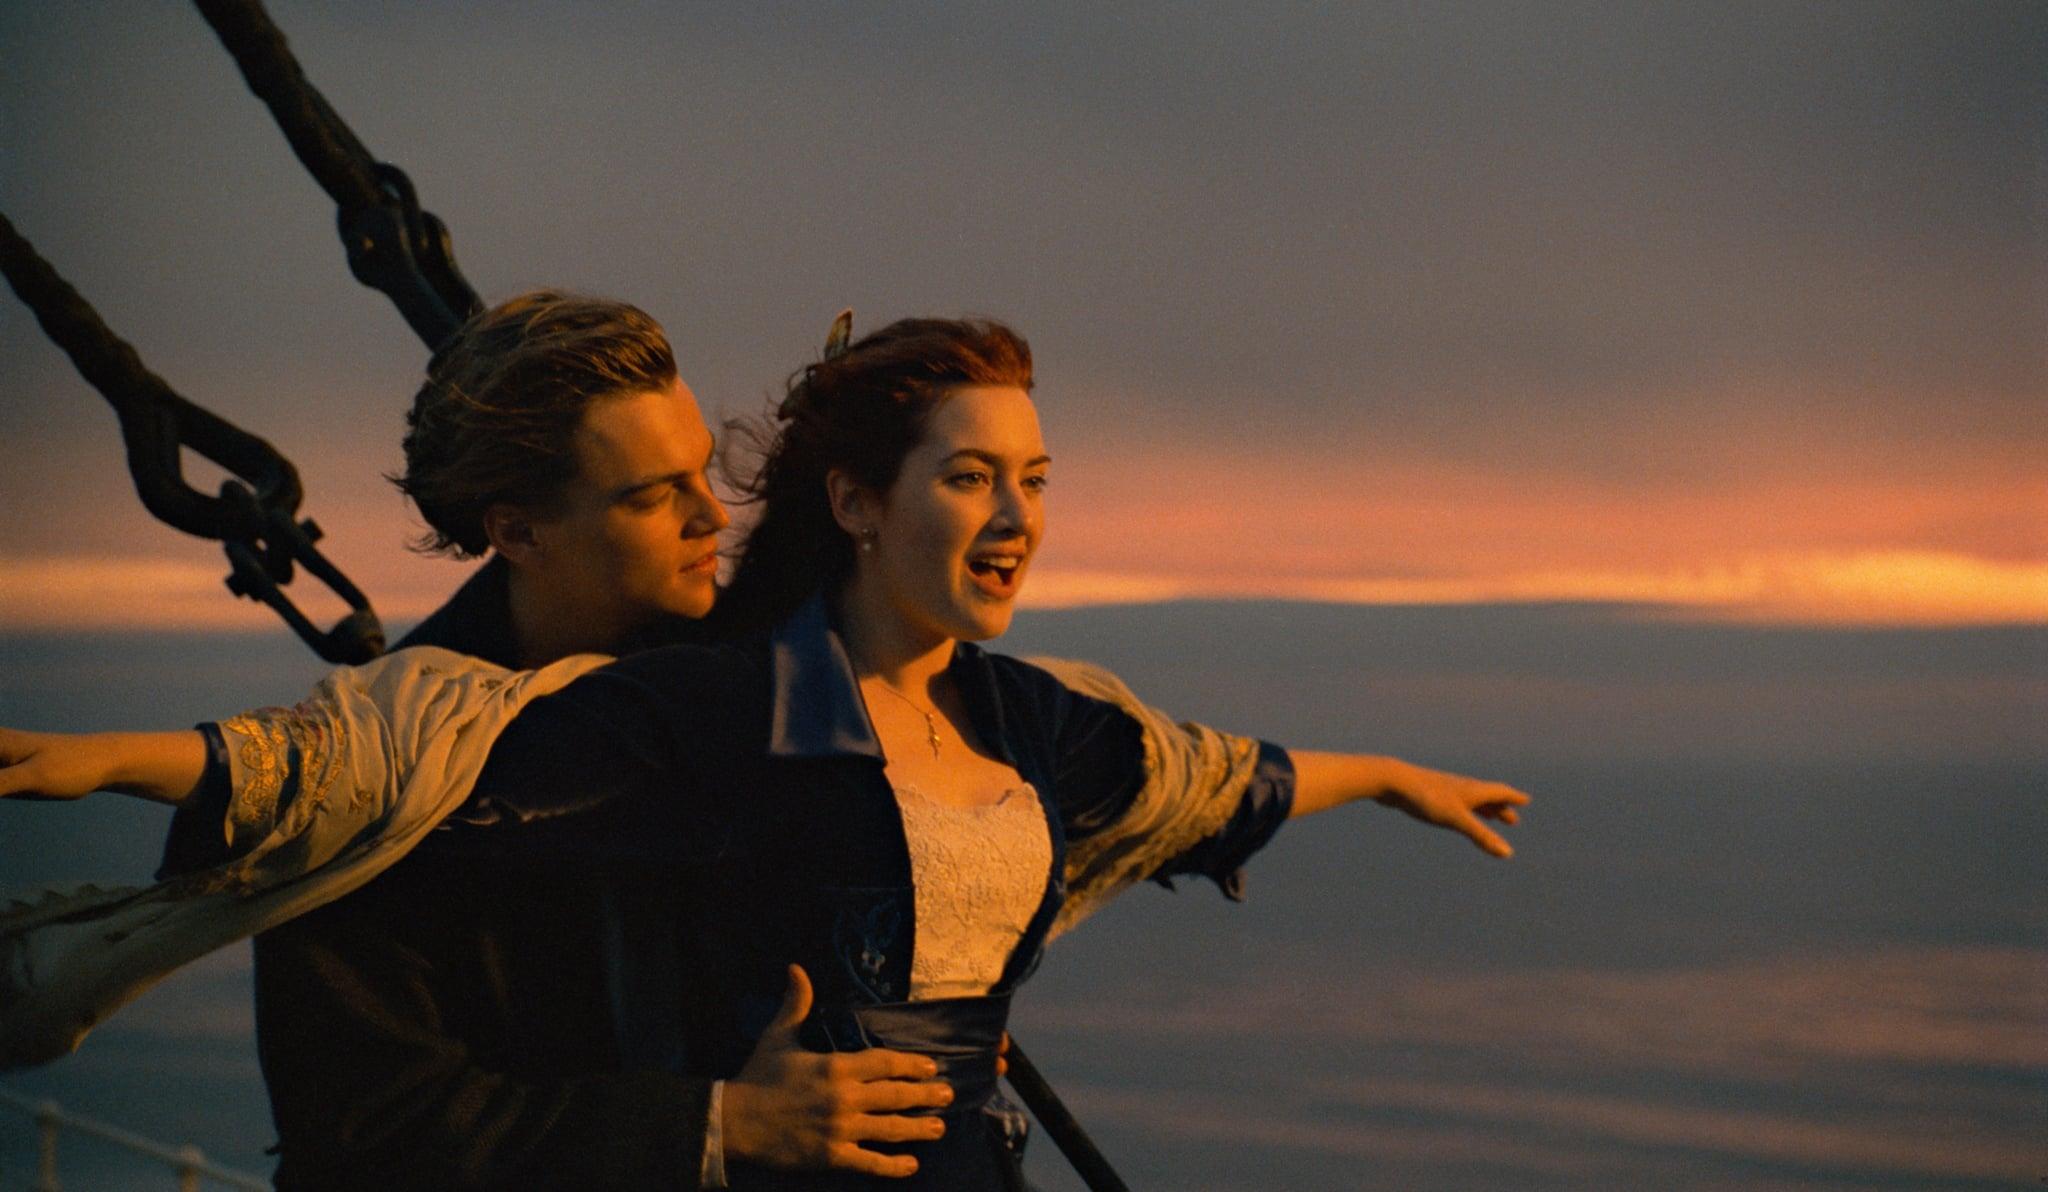 titanic movie facts popsugar celebrity uk